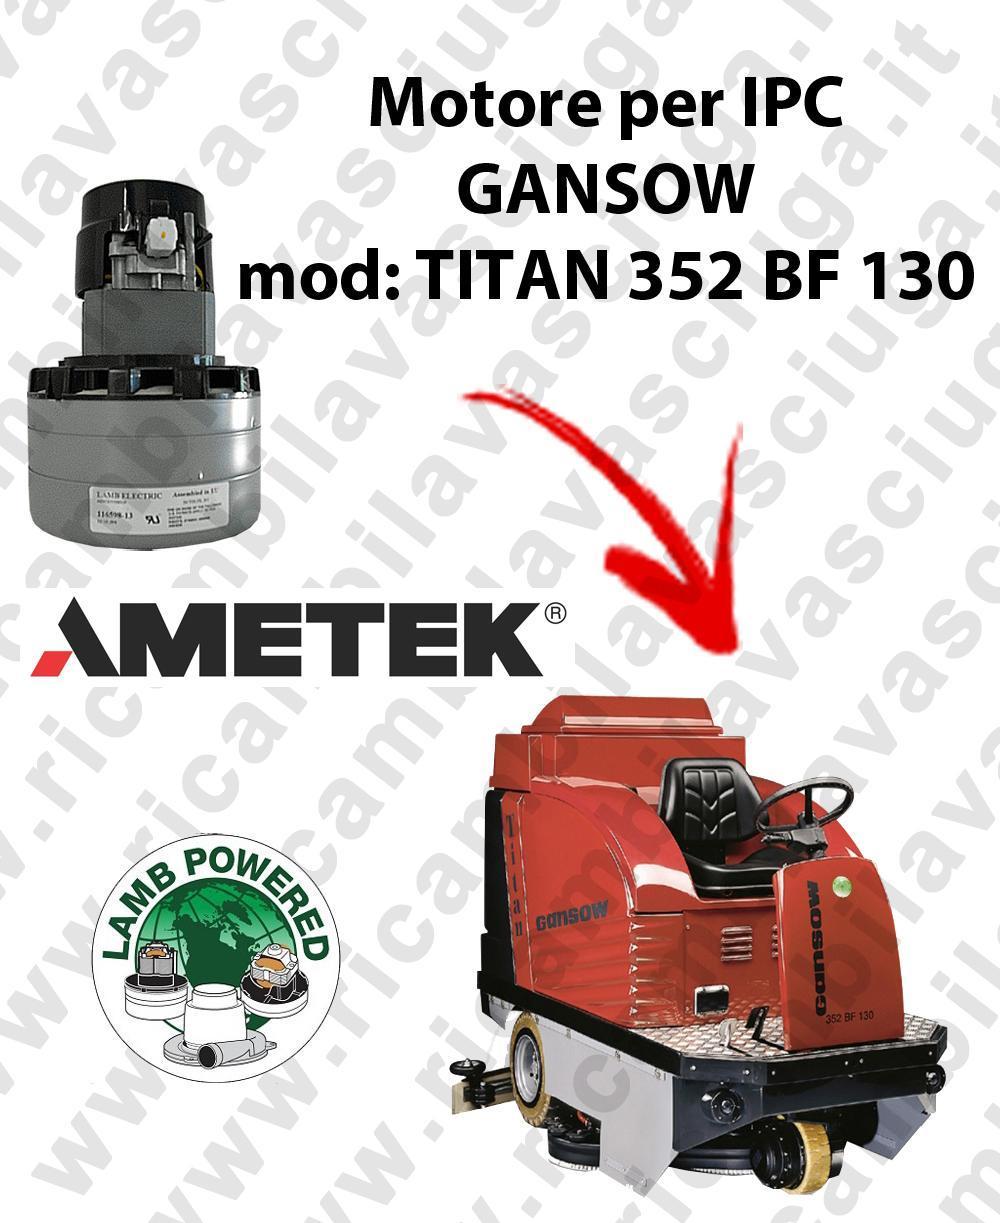 TITAN 352 BF 100 Motore de aspiración LAMB AMETEK para fregadora IPC GANSOW